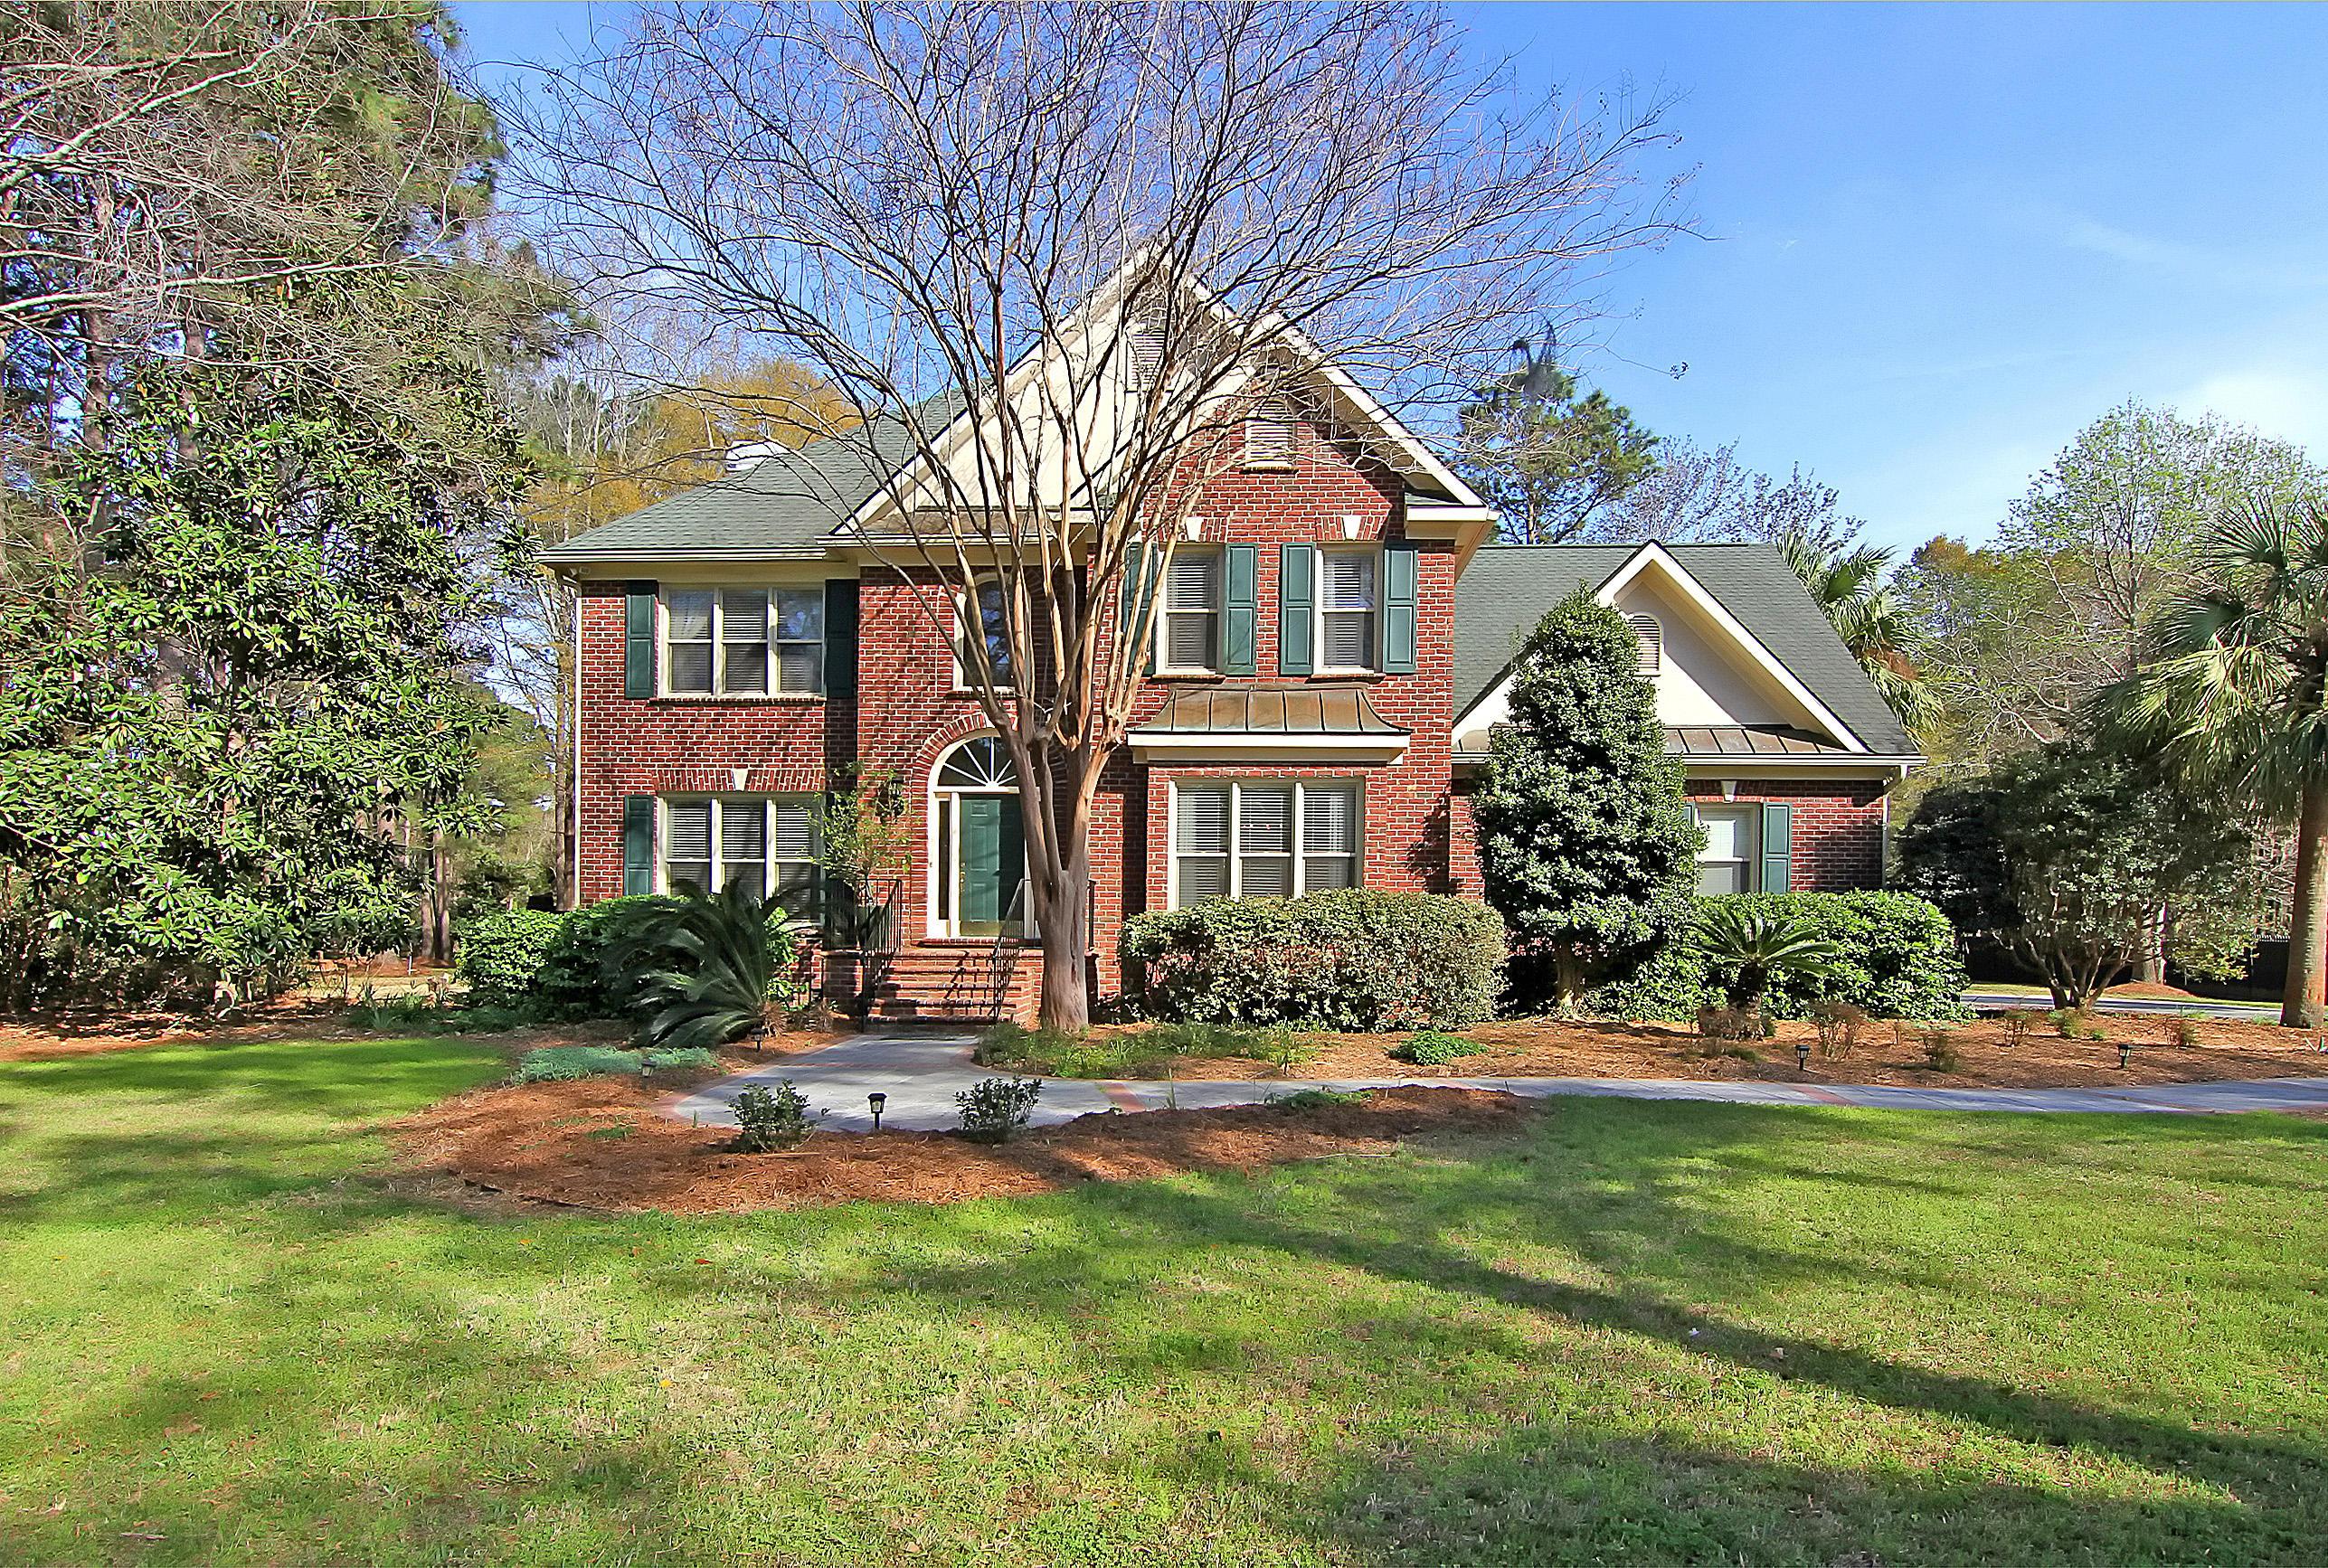 Dunes West Homes For Sale - 3463 Colonel Vanderhorst, Mount Pleasant, SC - 53